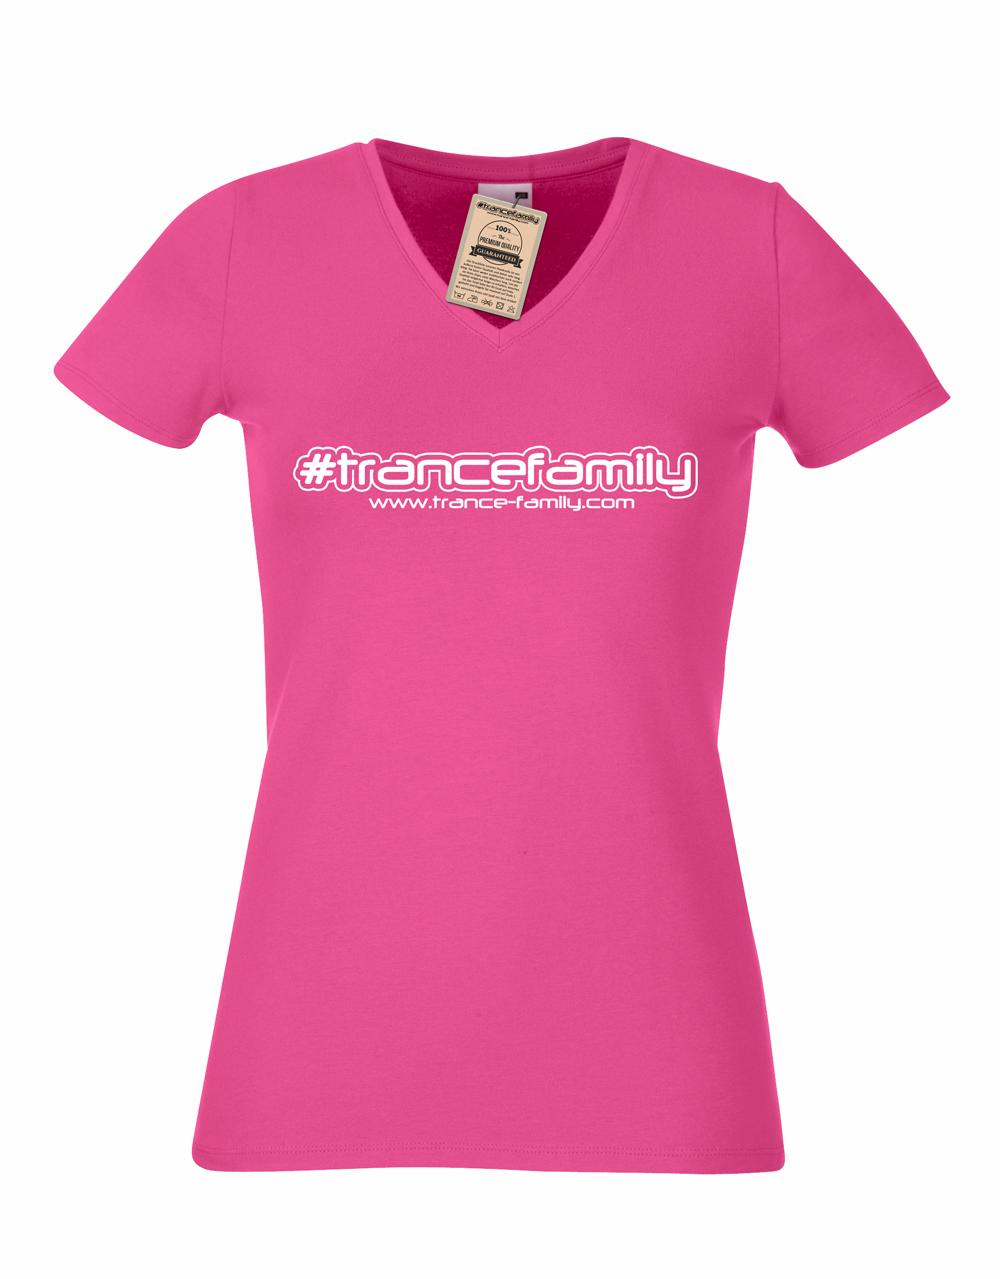 Trance-Family.com  (#trancefamily T-Shirt Women) M1-TFC  00083